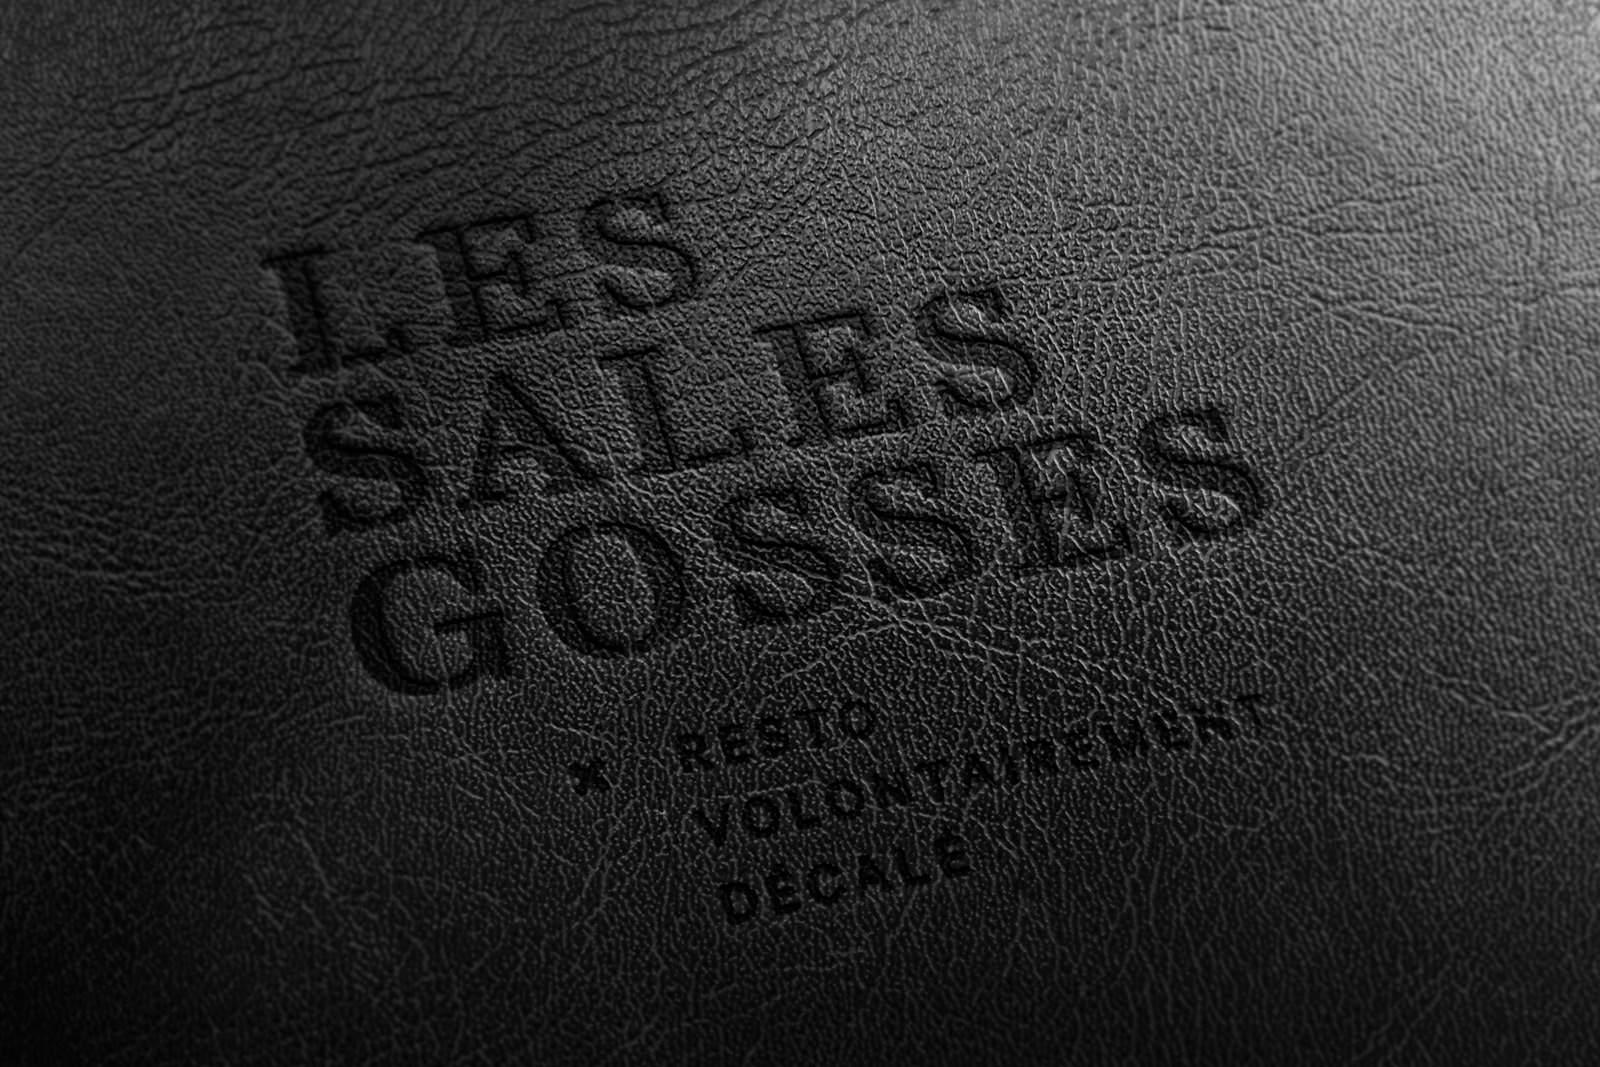 Figure-LesSalesGosses-Restaurant-Logo-Branding-Quebec-Jeremy-Hall-11.jpg